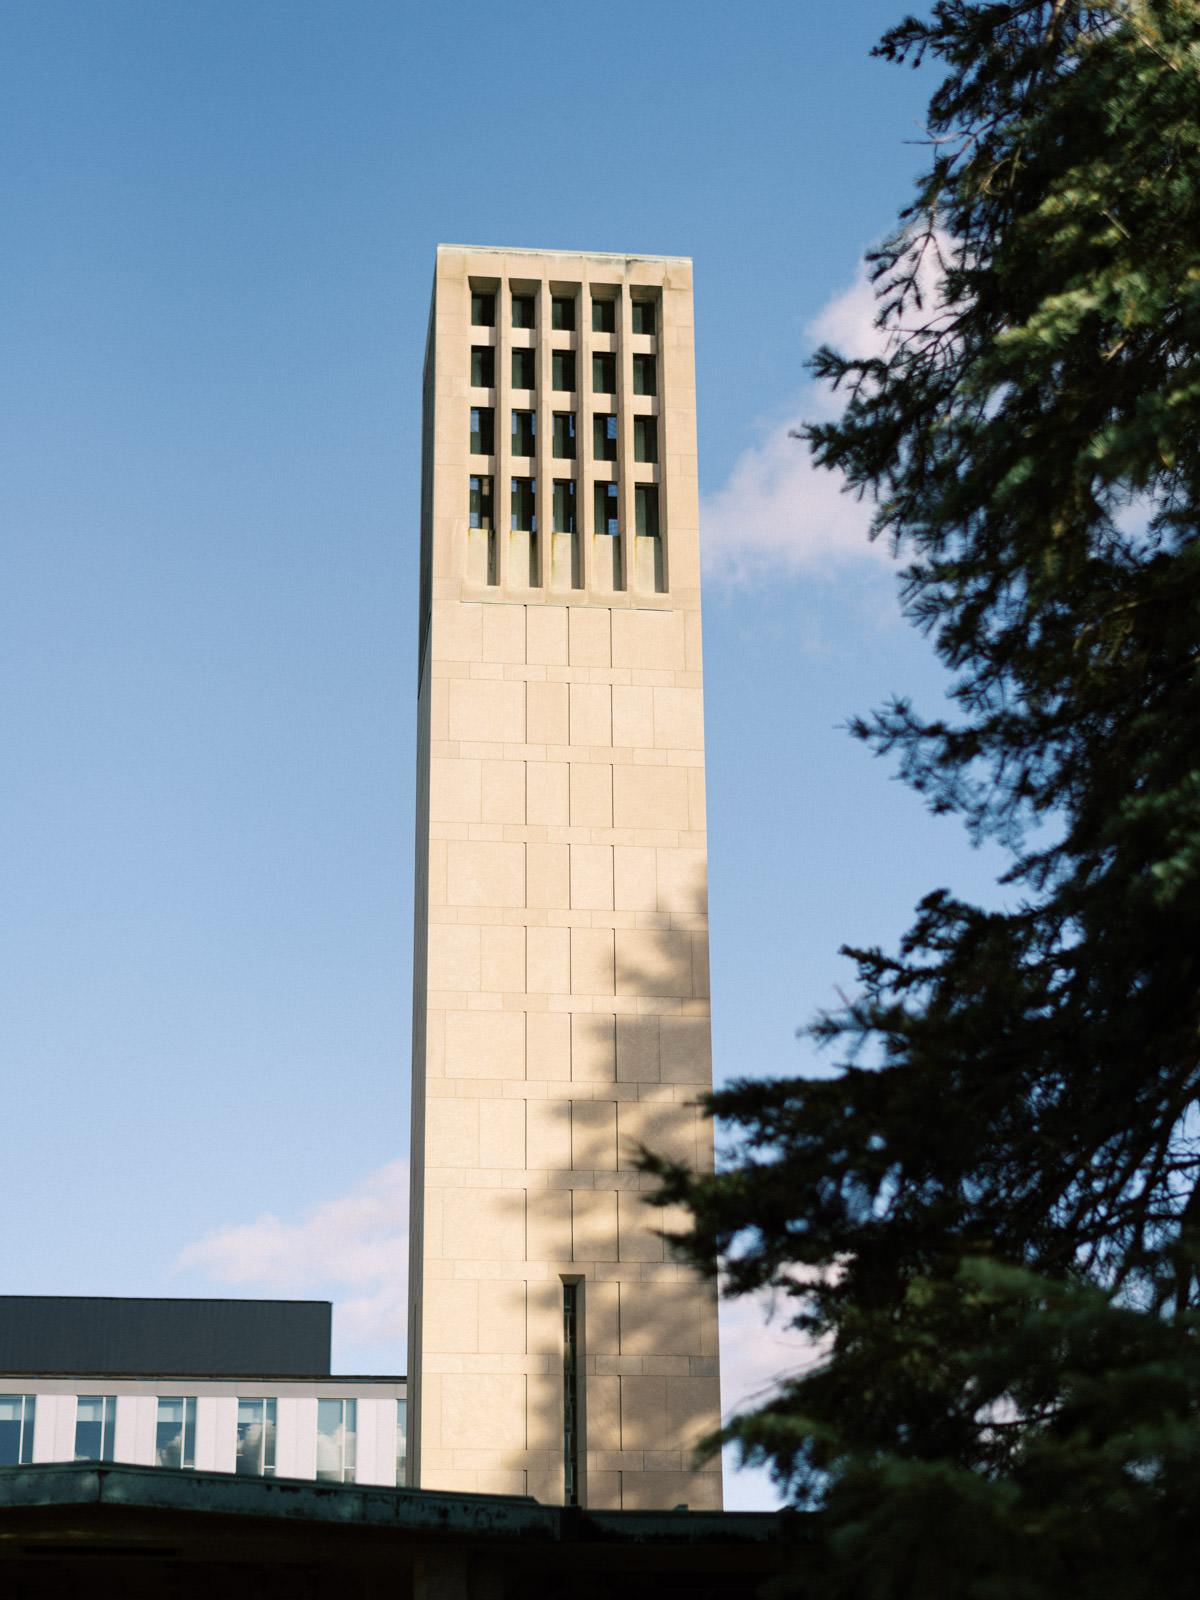 building at mcmaster university